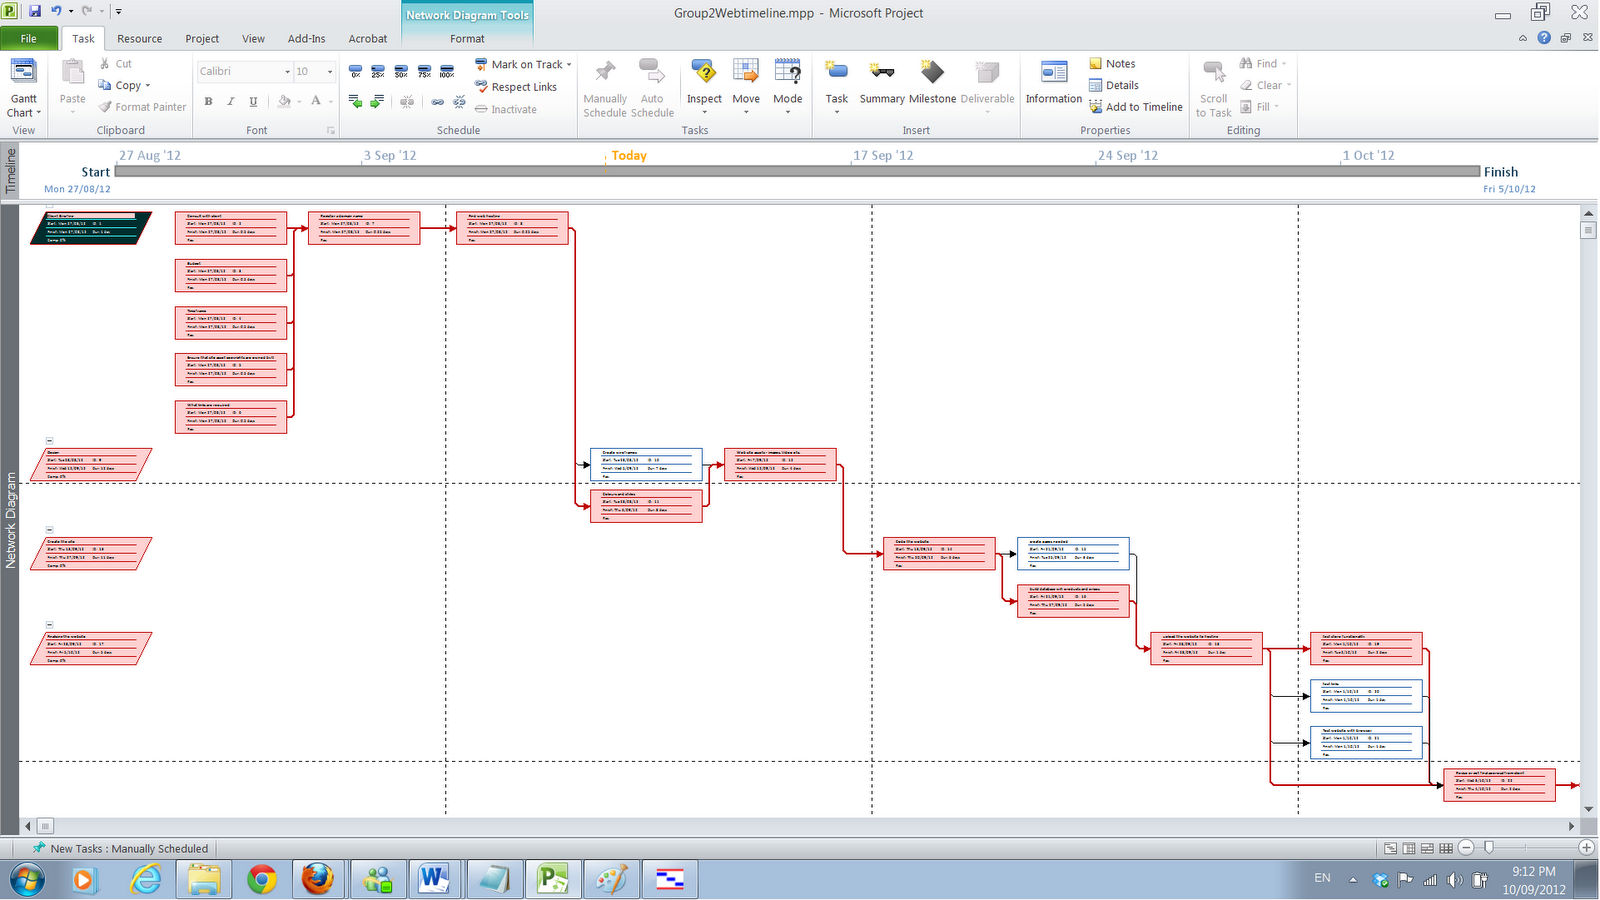 network diagram ms project 2010 [ 1600 x 900 Pixel ]